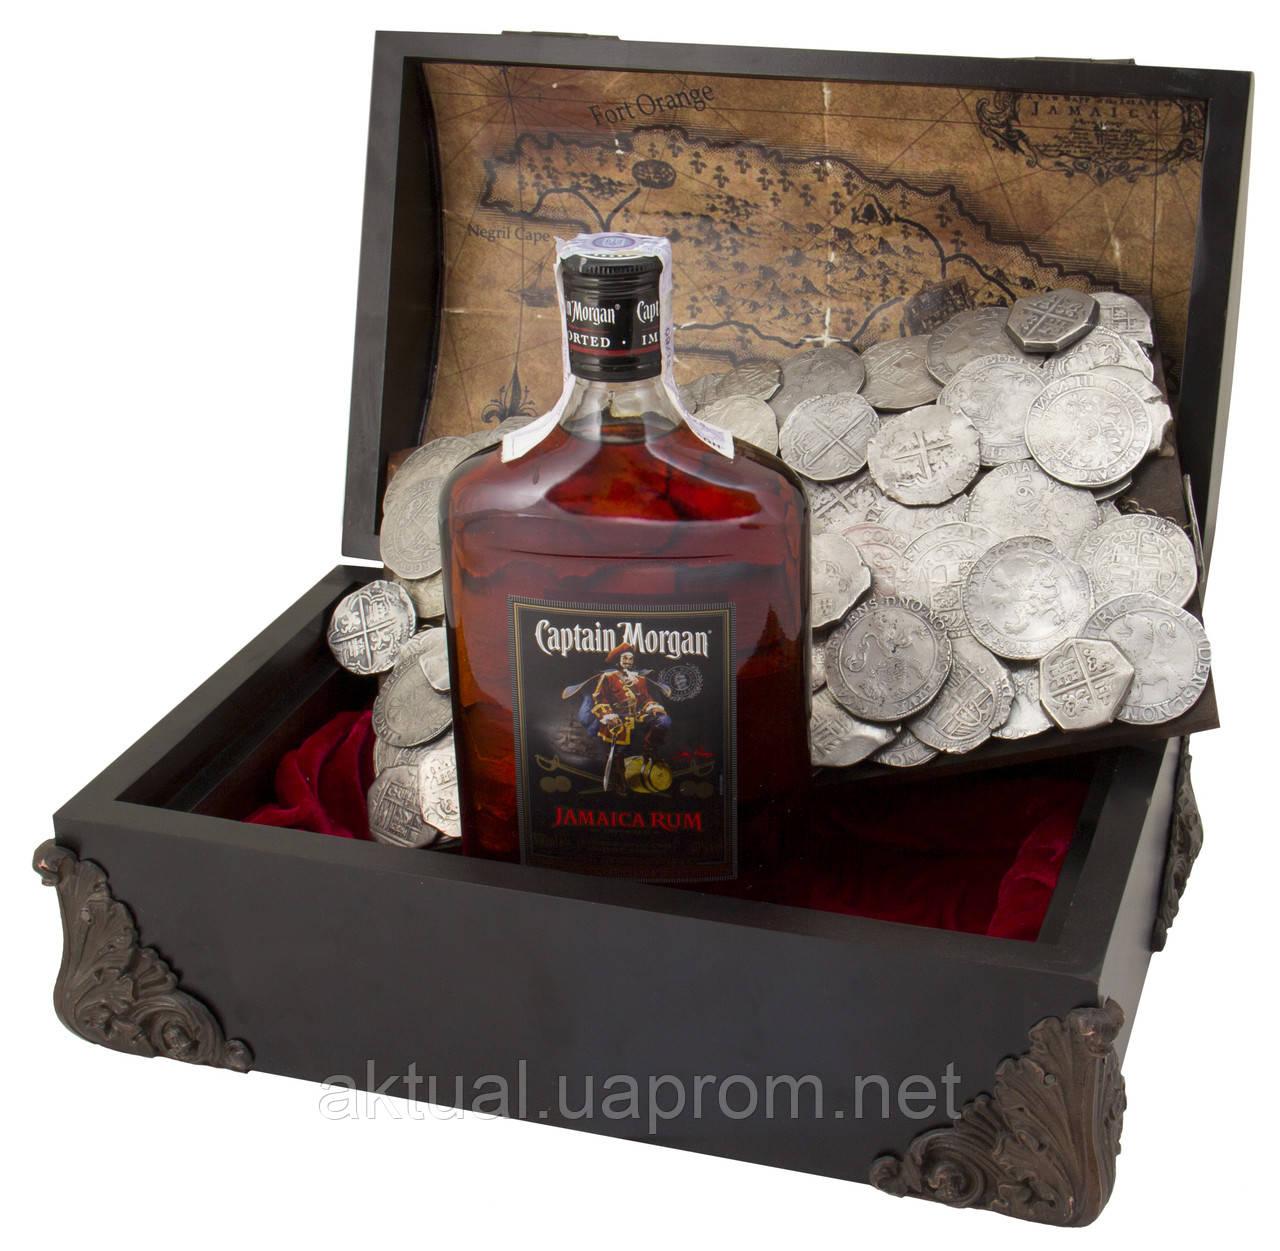 Сундук под Виски или Бренди